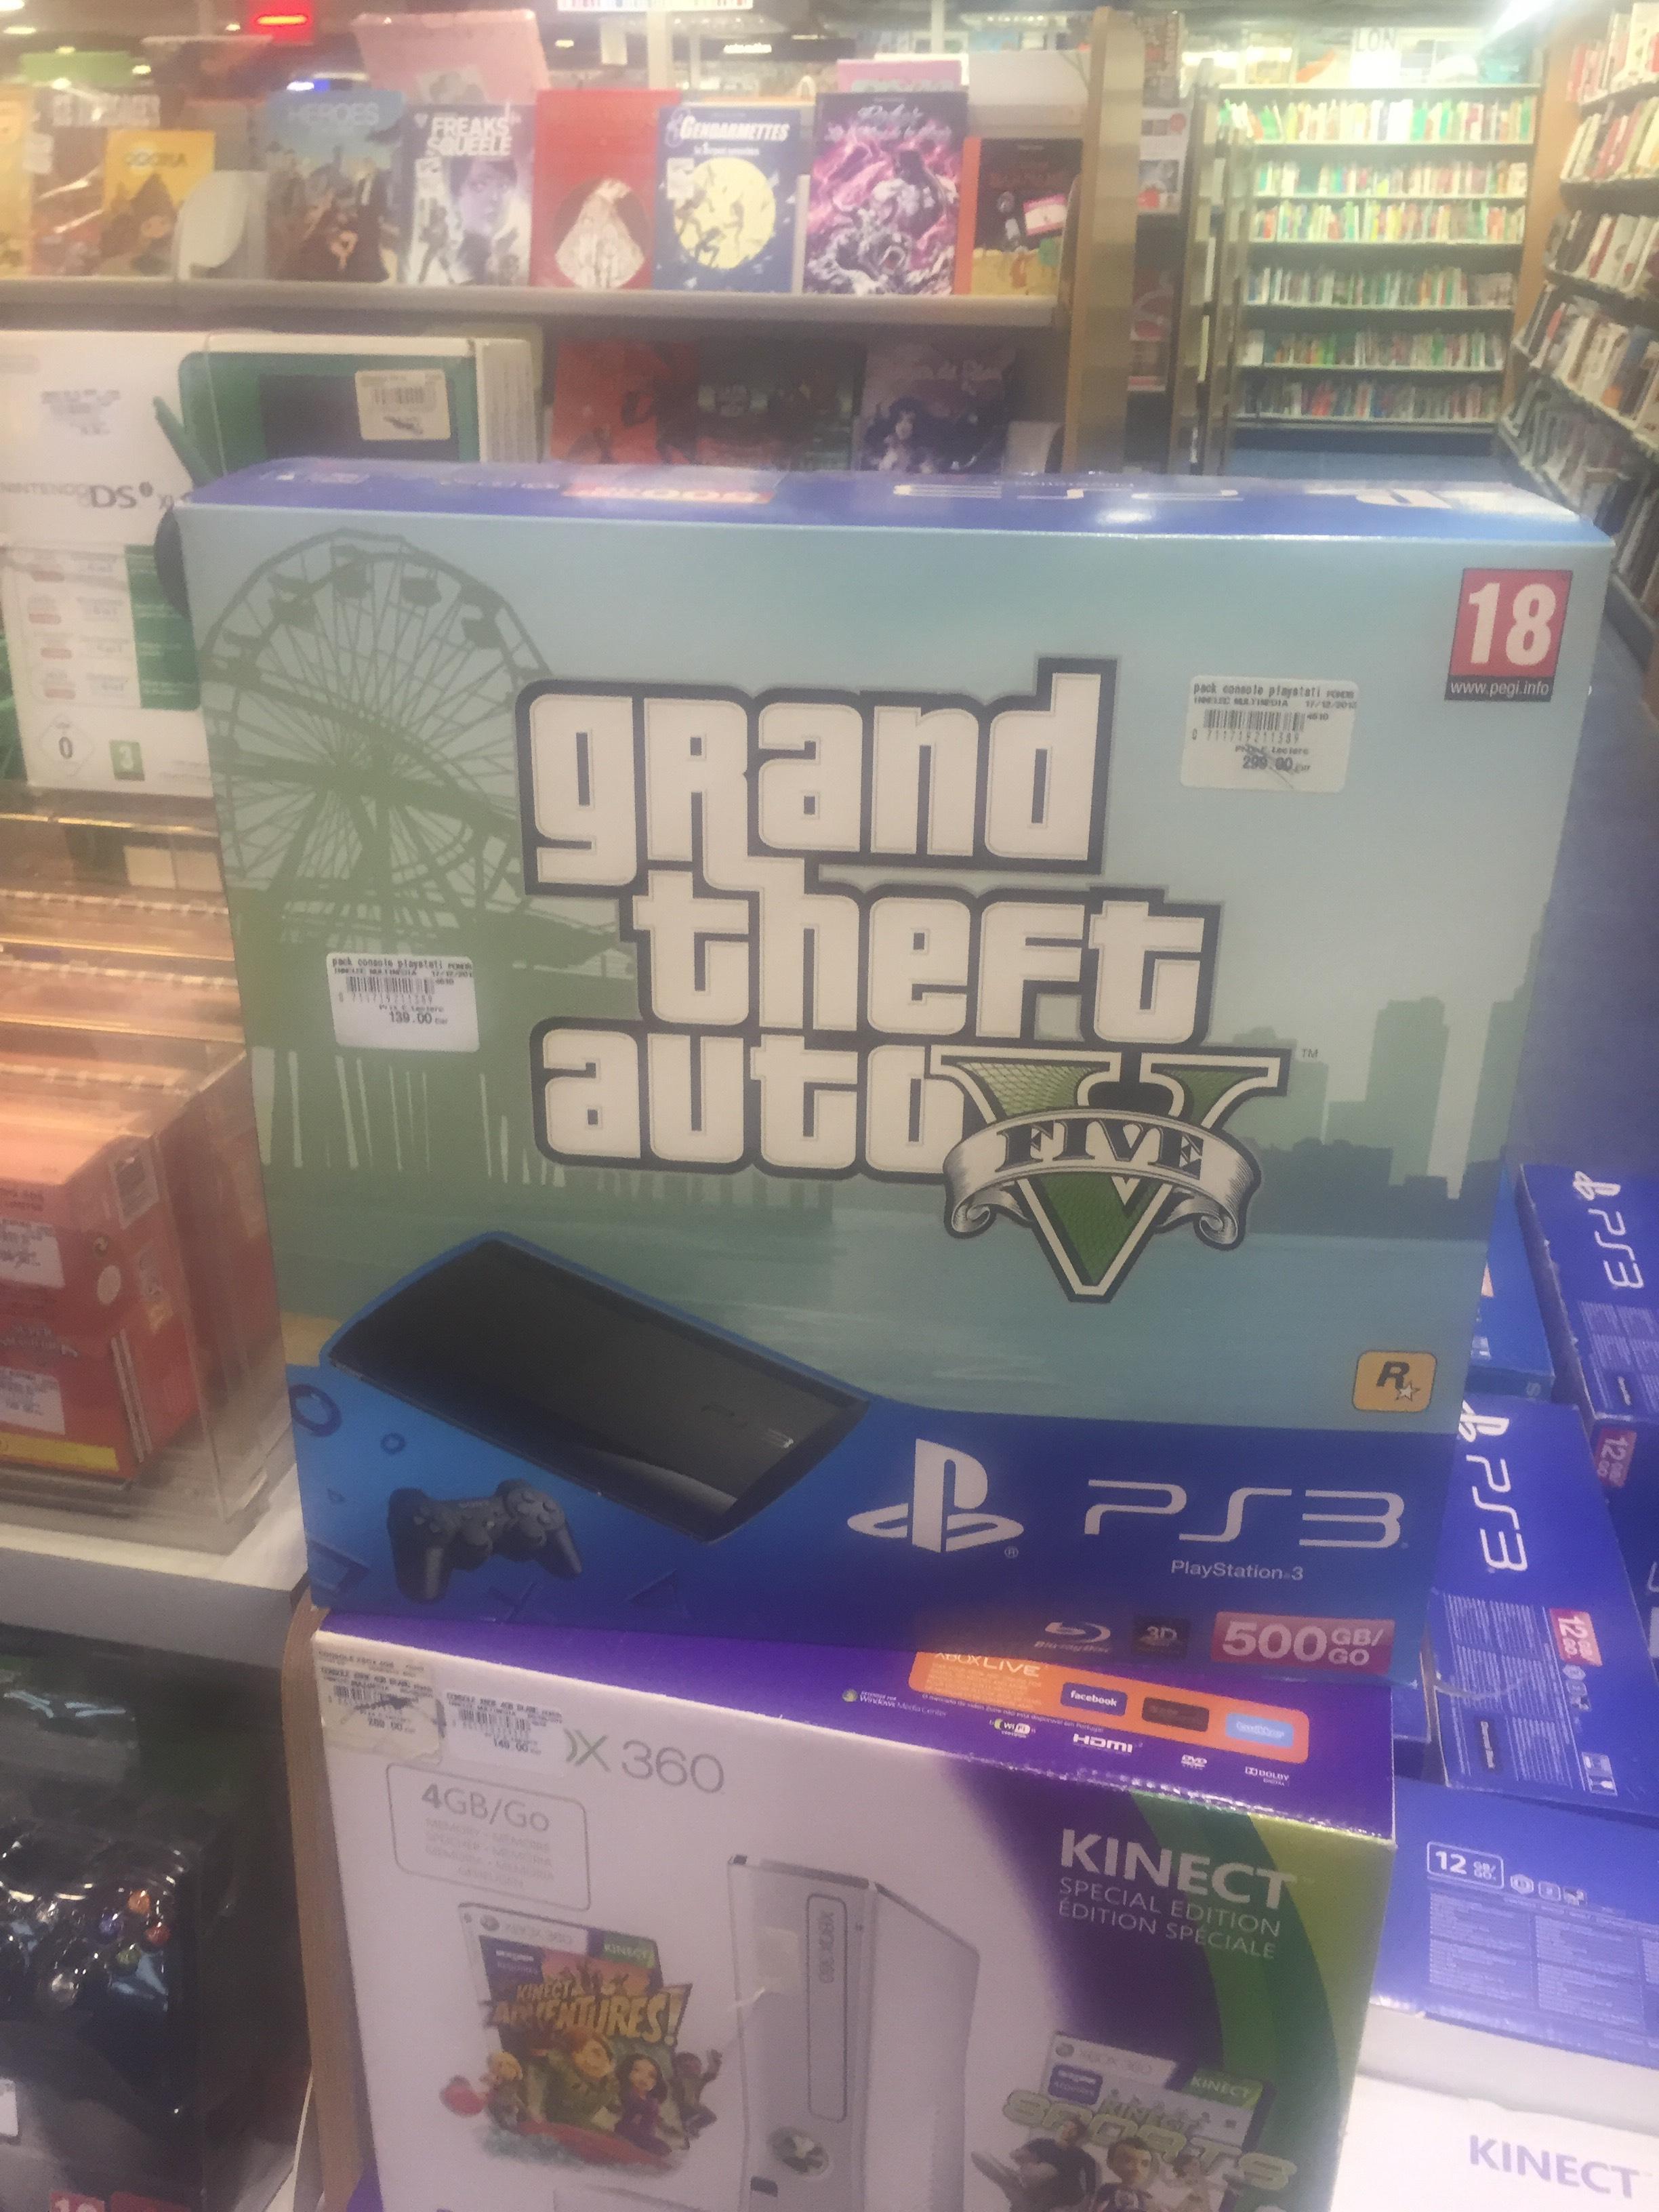 Sélection de packs PS3 soldés - Ex : Pack PS3 500Go + GTA V